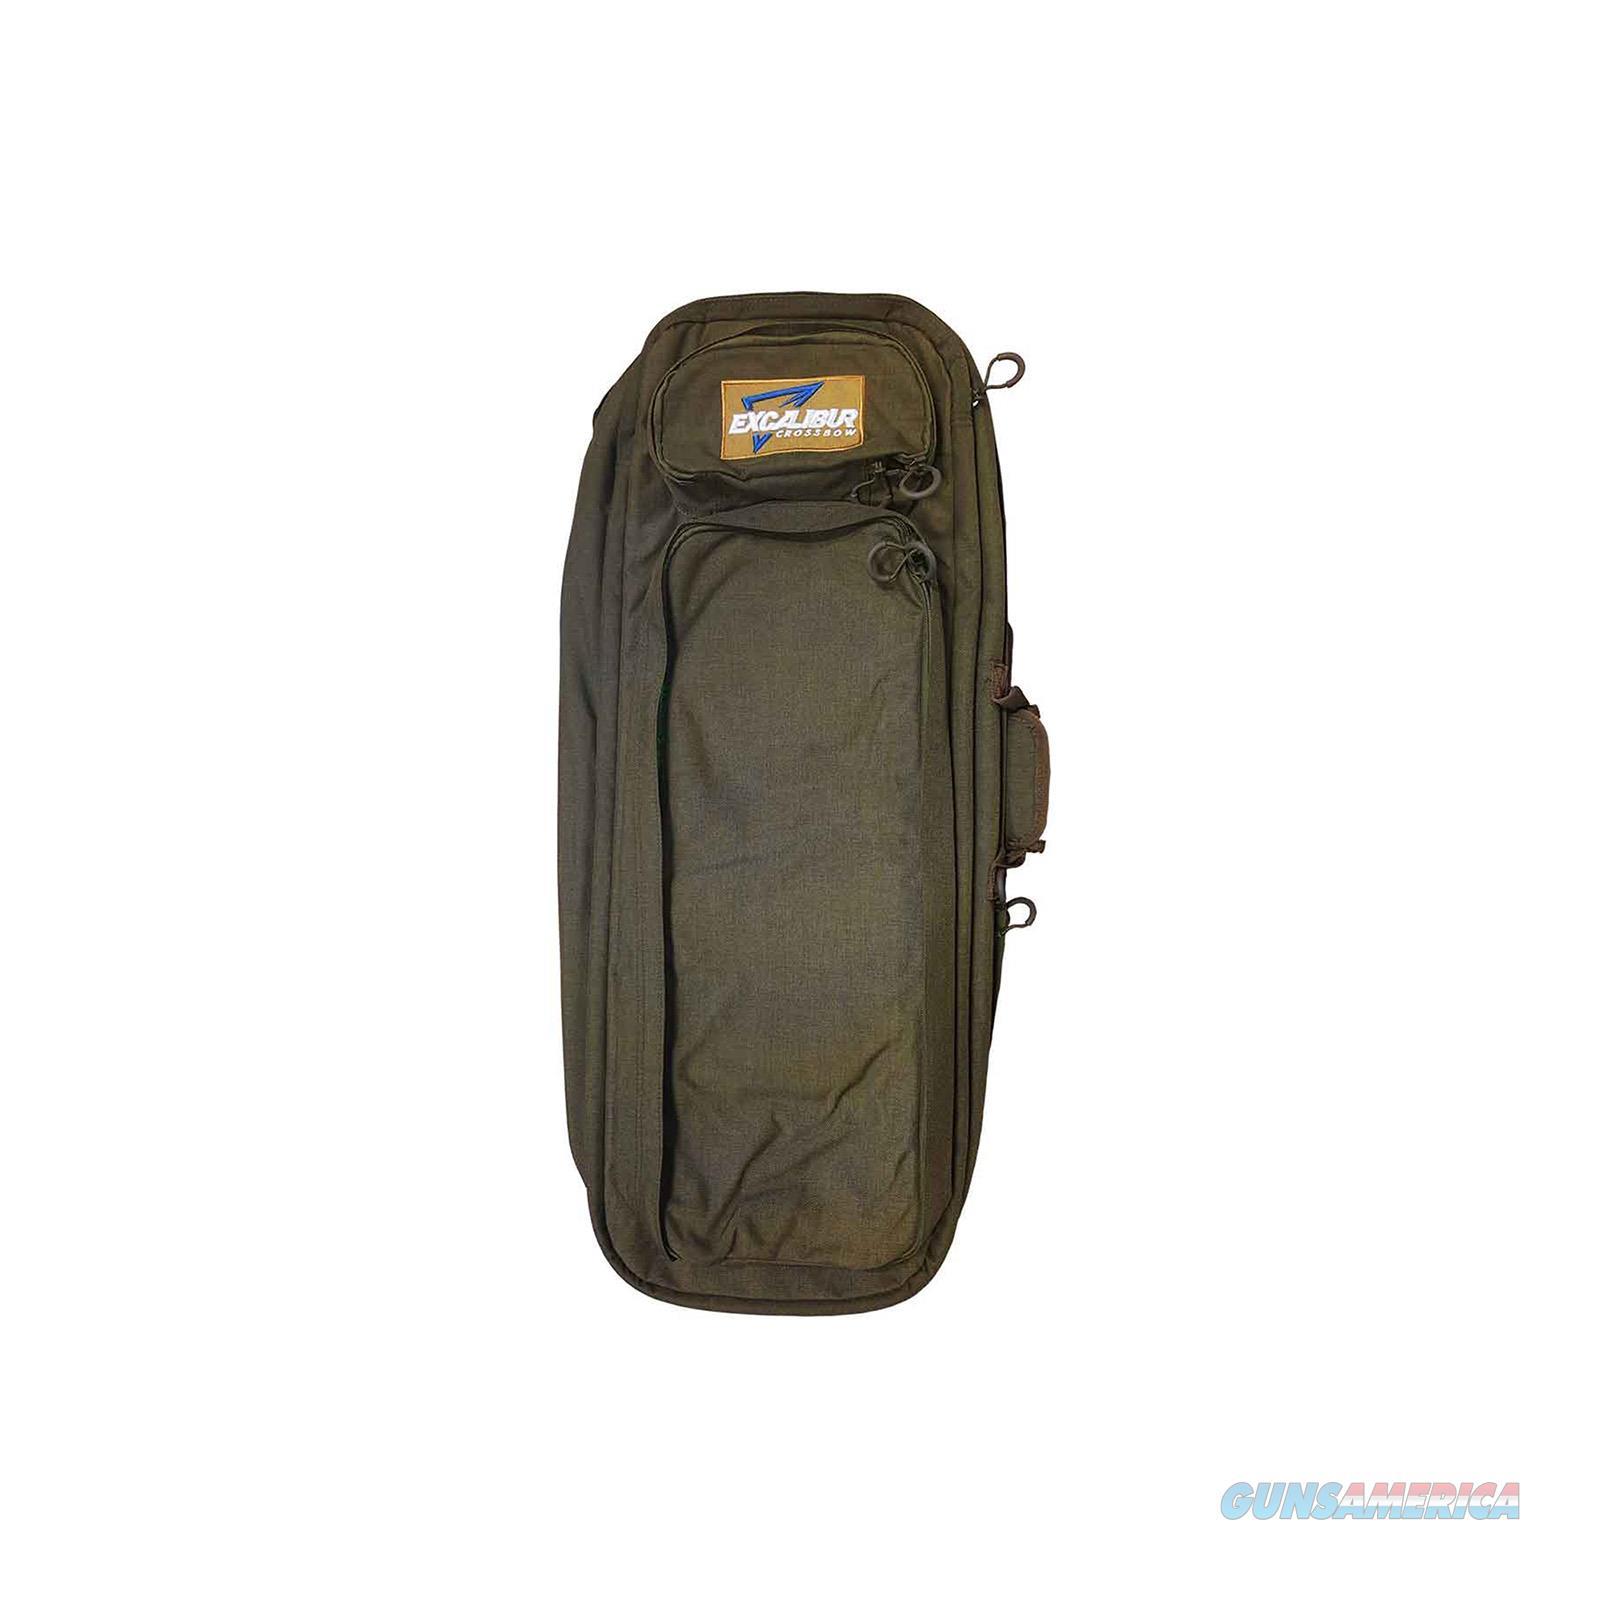 Excalibur Explore Case Take-Down Crossbow Case, Brown 97511  Non-Guns > Archery > Bows > Crossbows